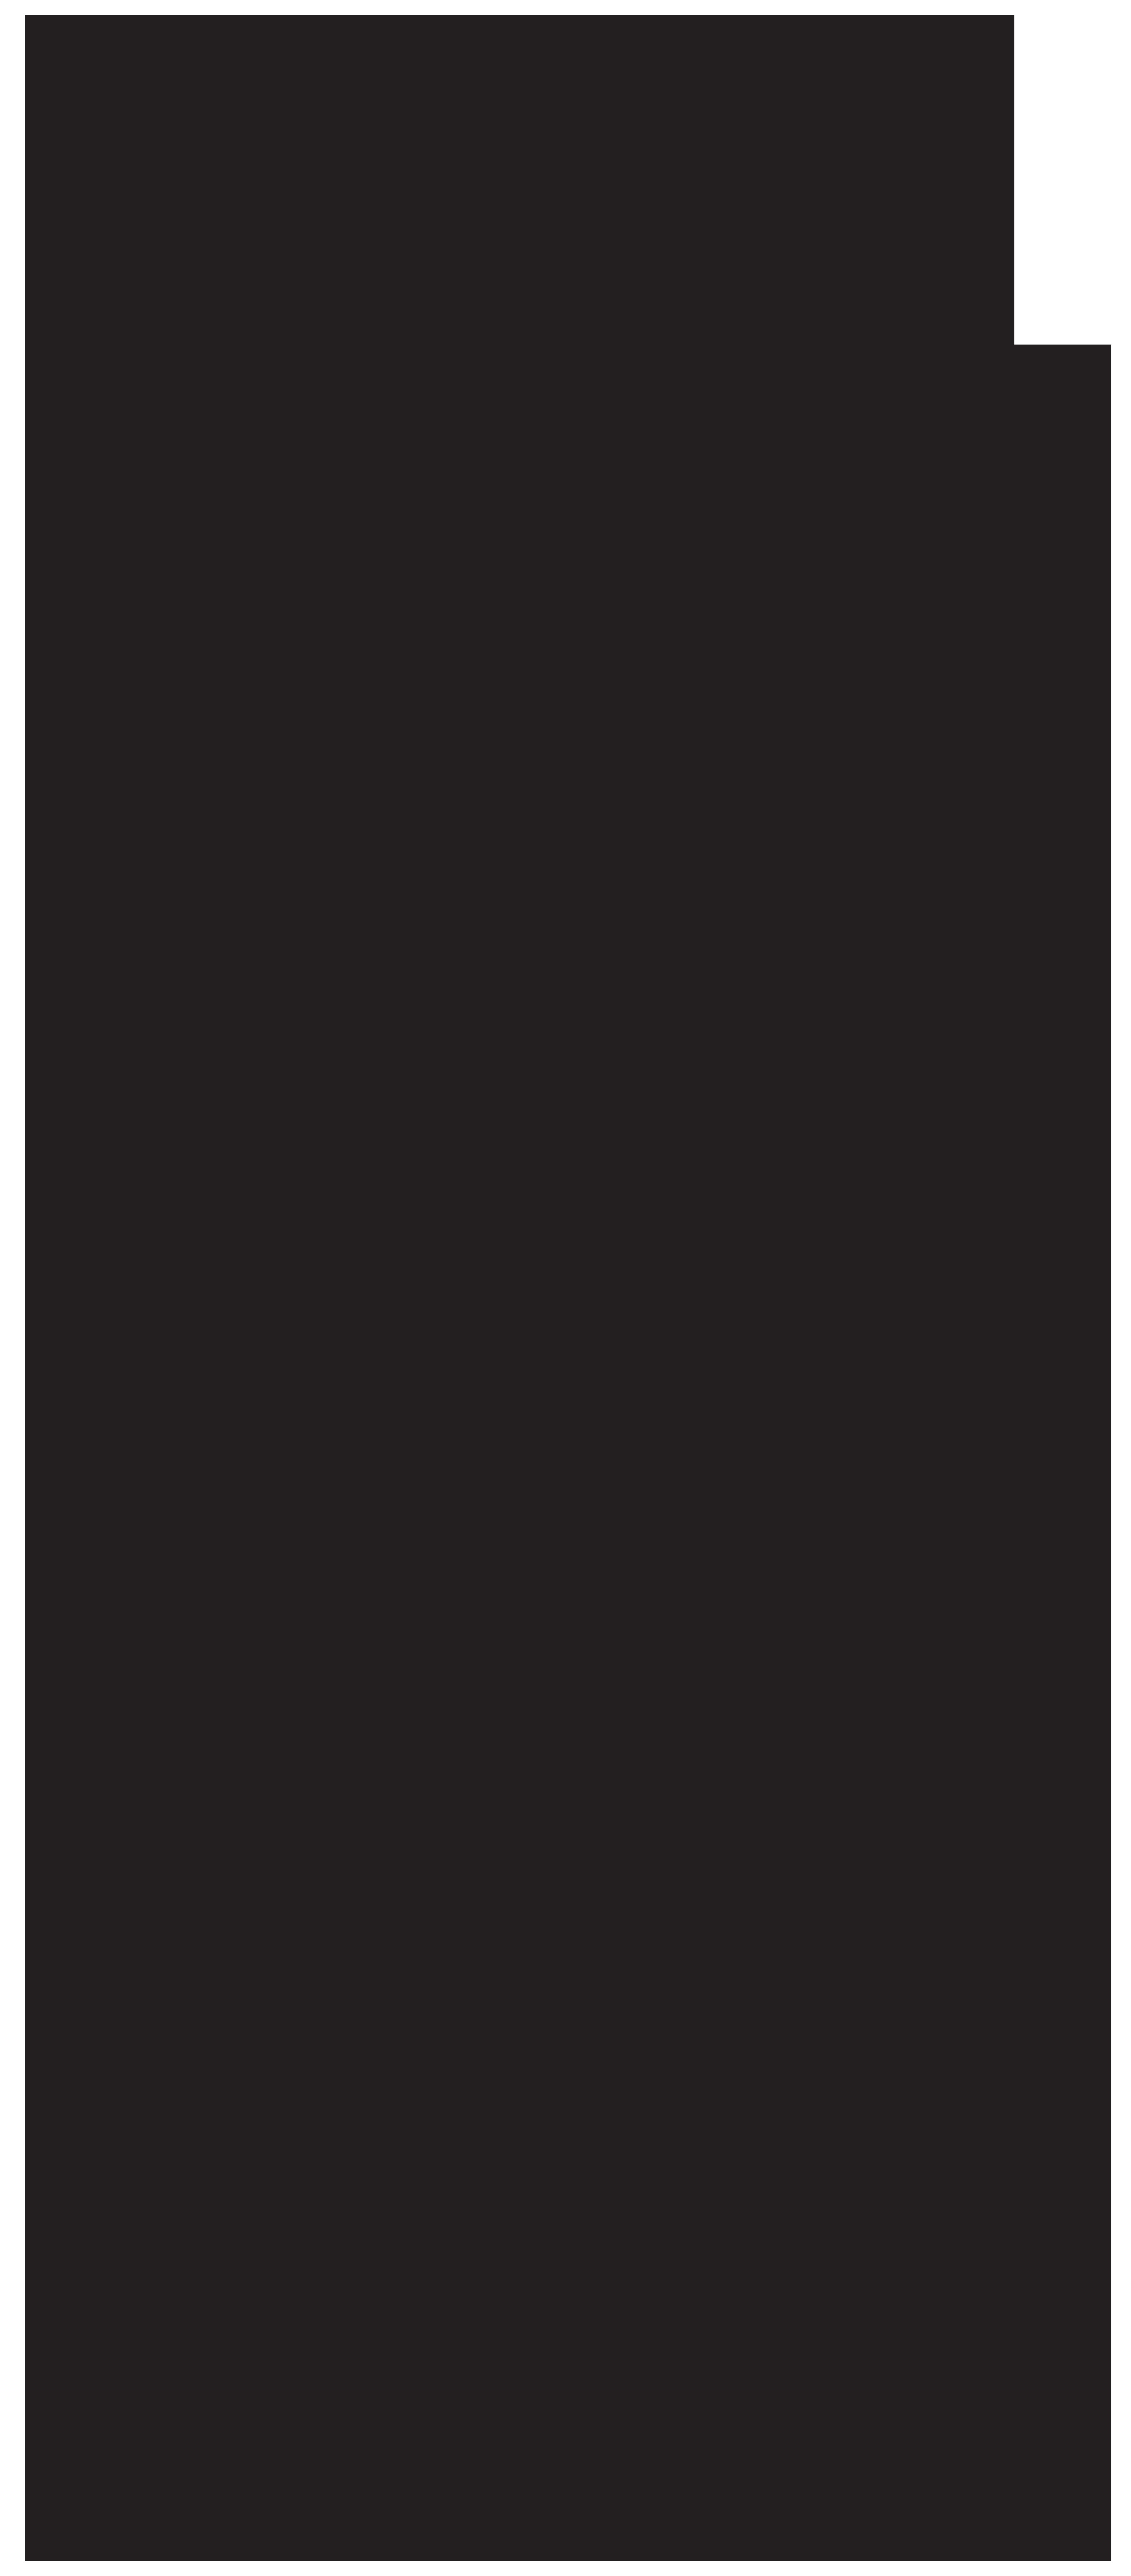 Surfer Silhouette Clip Art PNG Image.